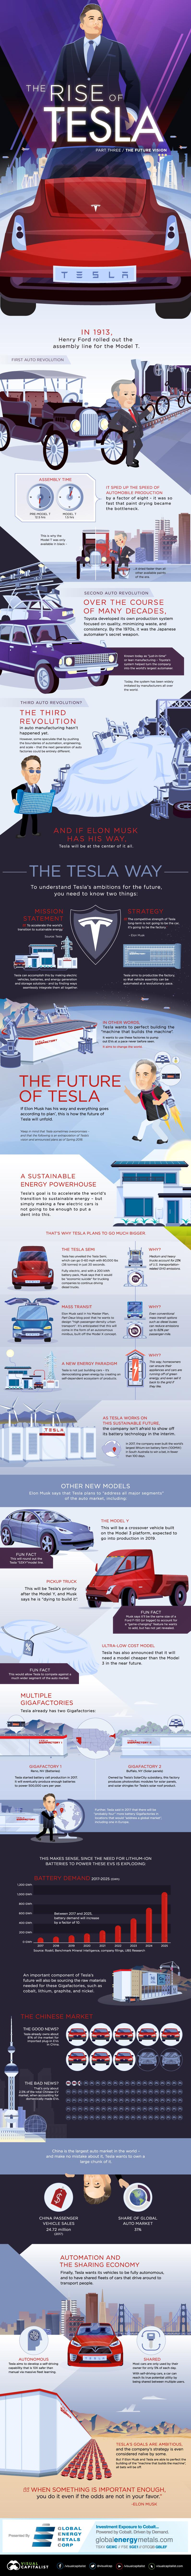 tesla-Part 3 -vision-infographic